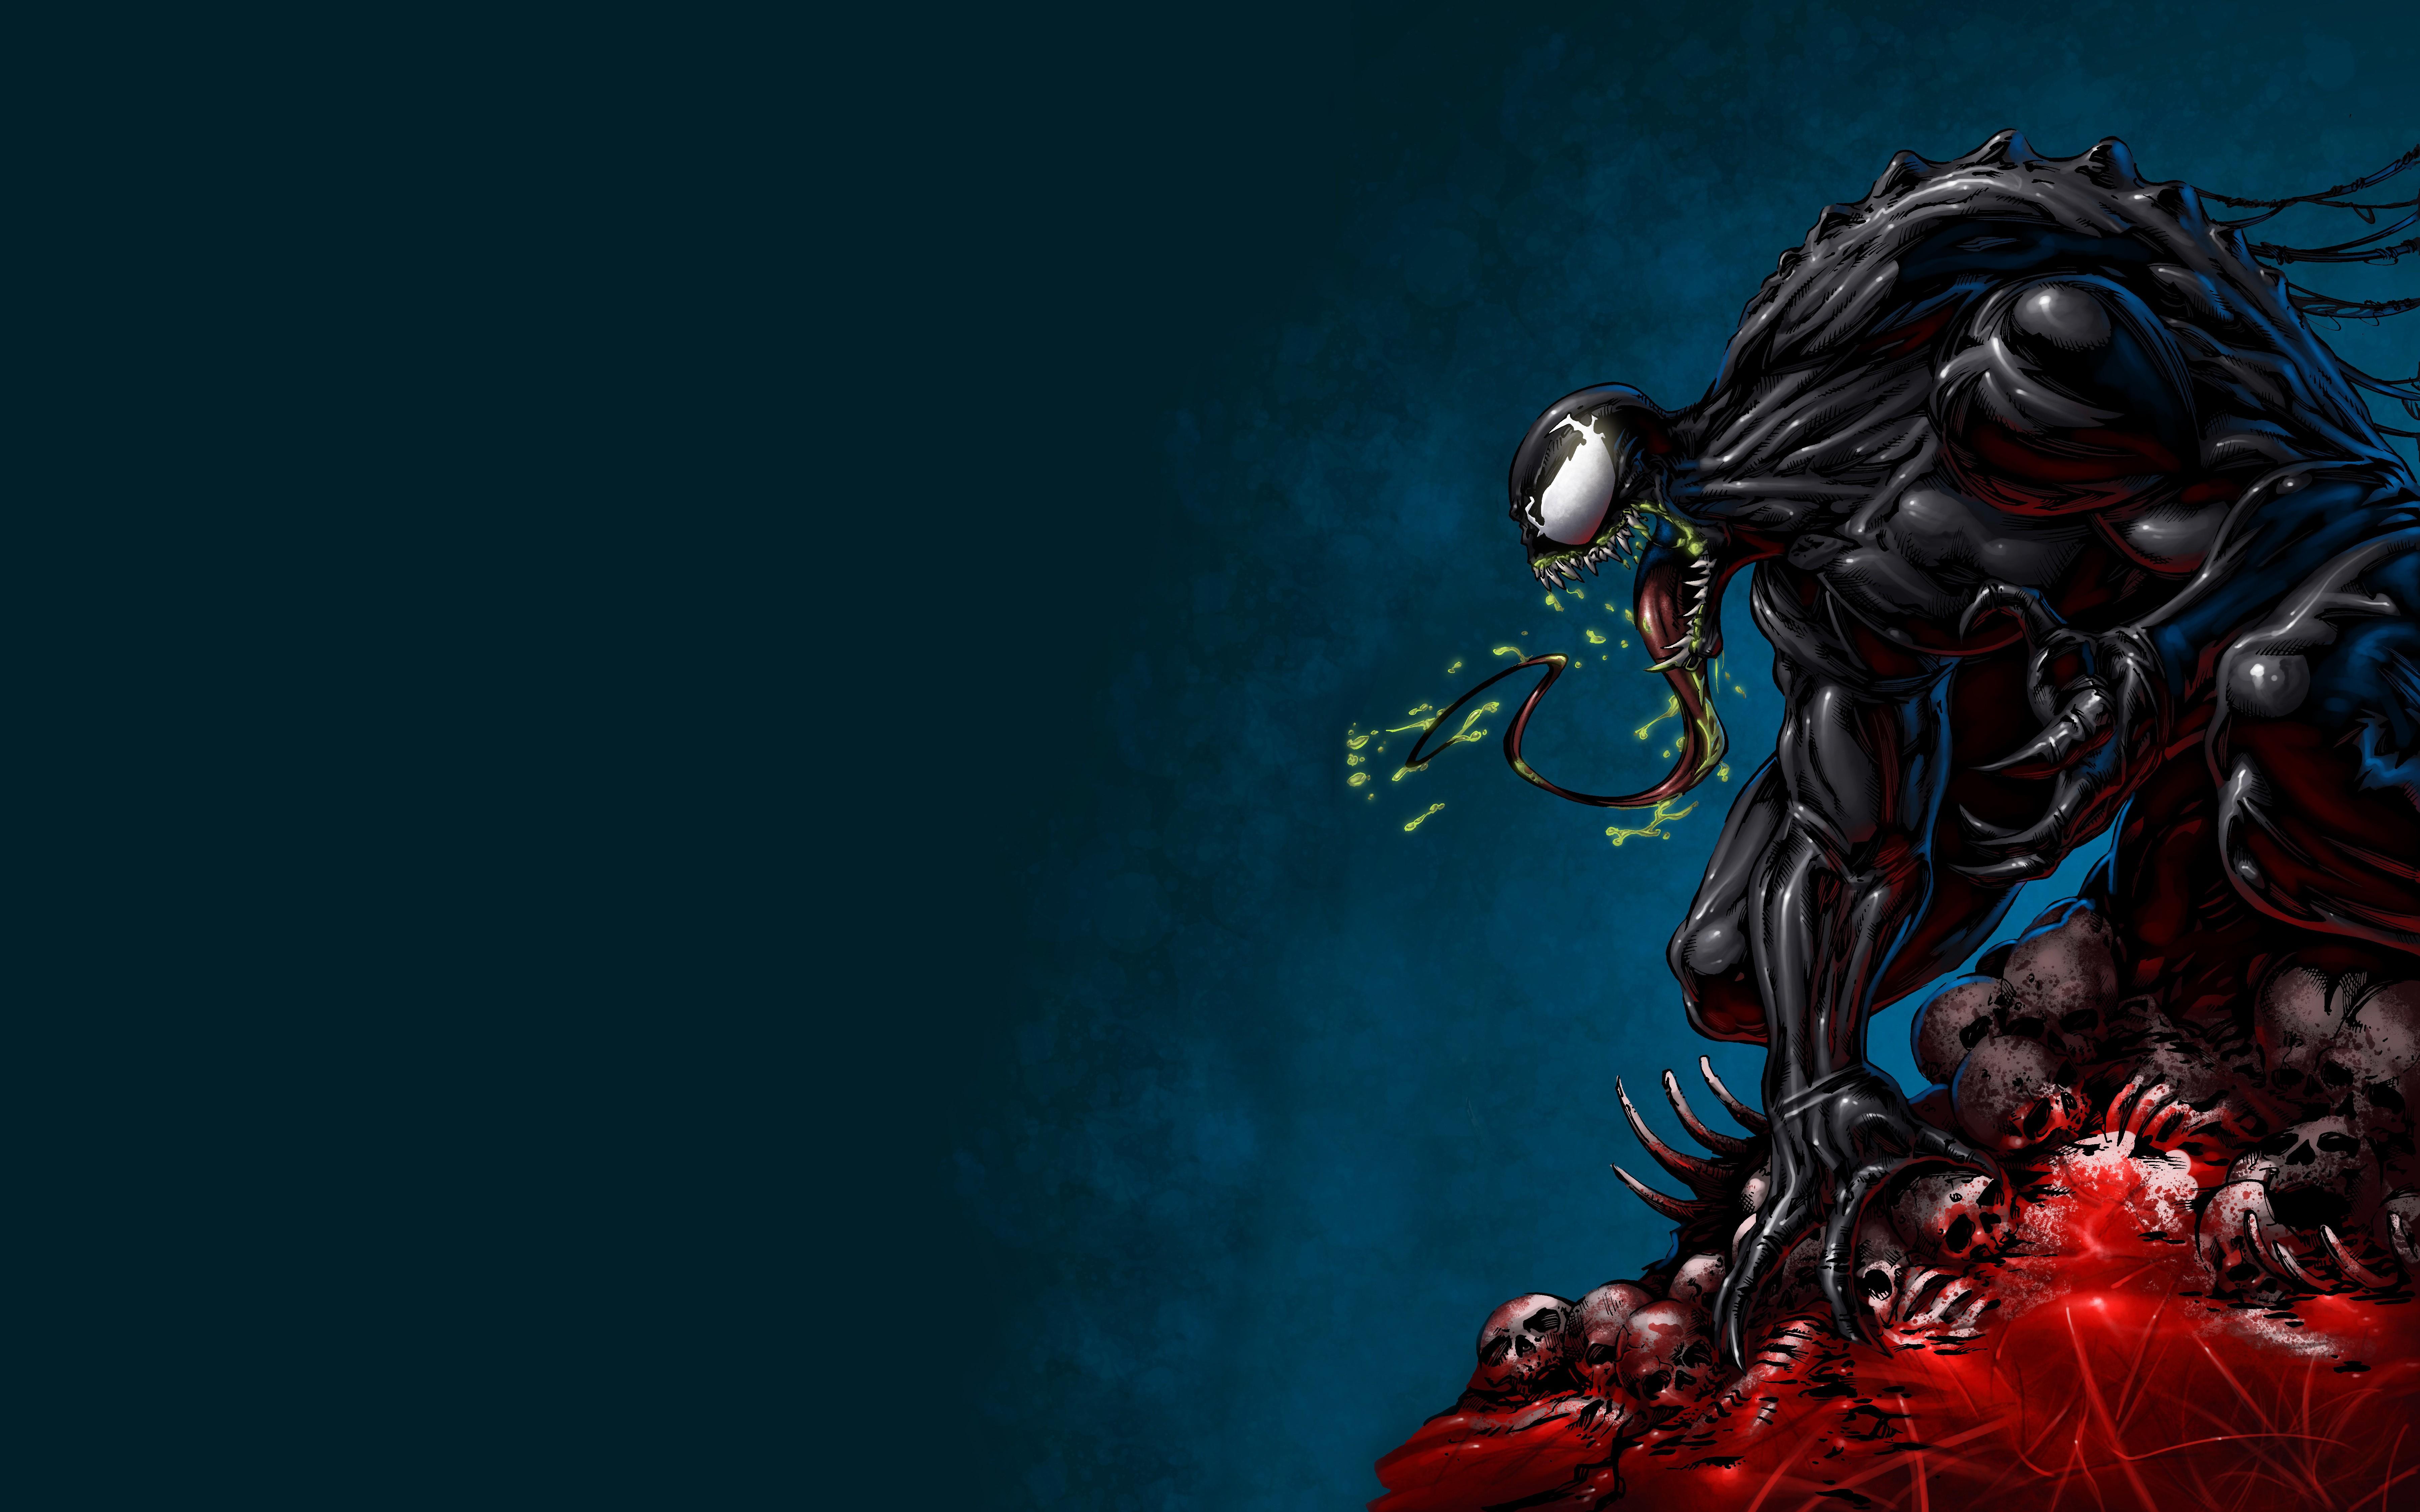 3840x2160 Venom Marvel Comics 8k 4k HD 4k Wallpapers ...